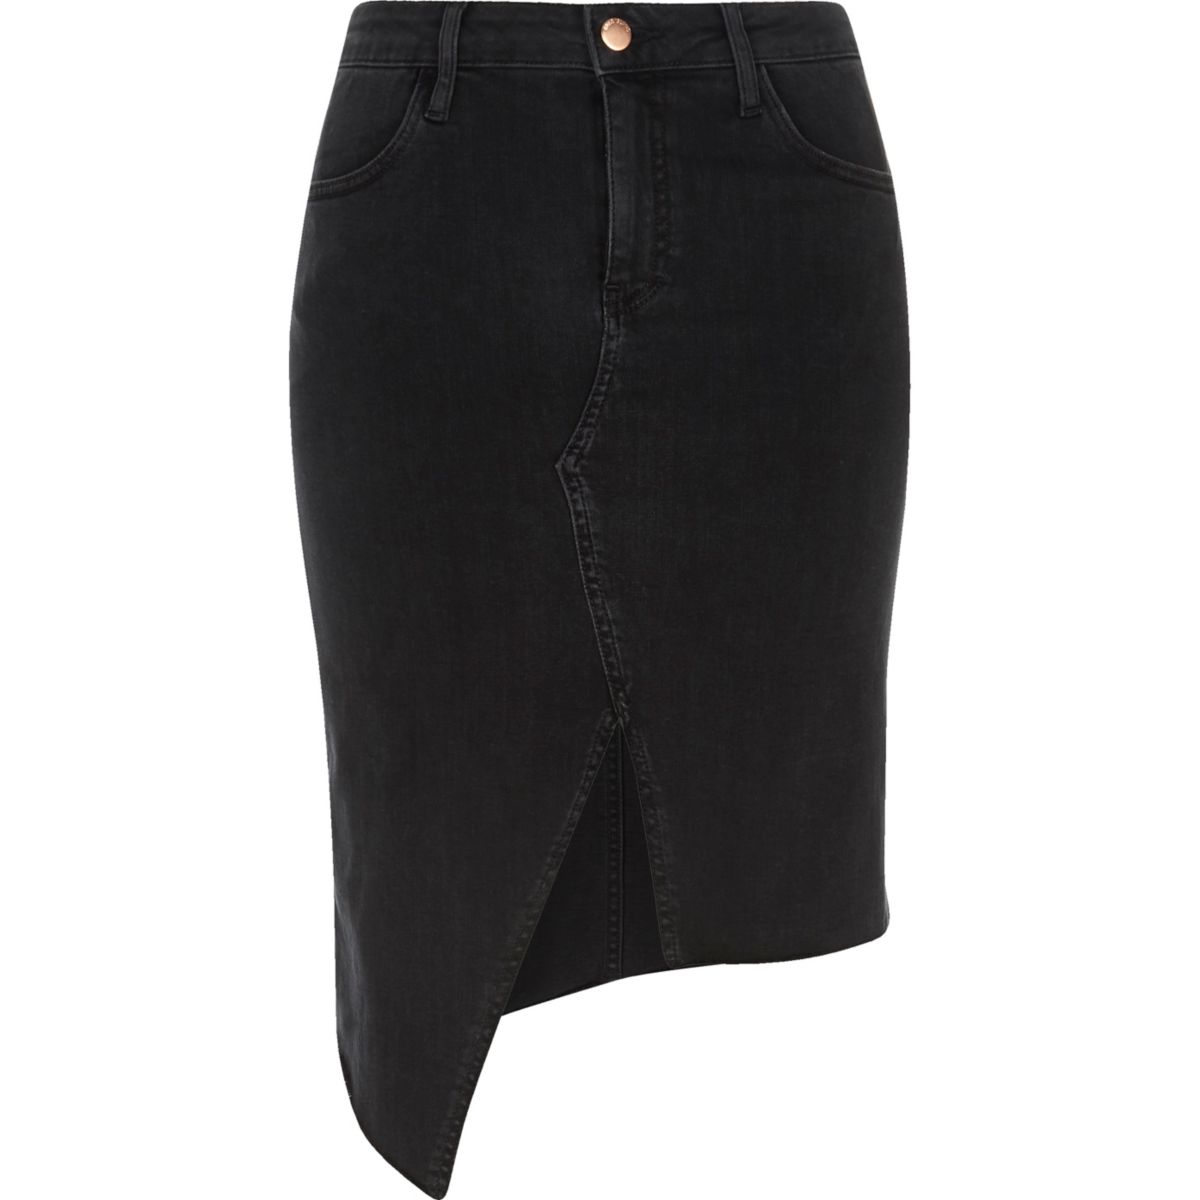 Black washed asymmetric denim skirt